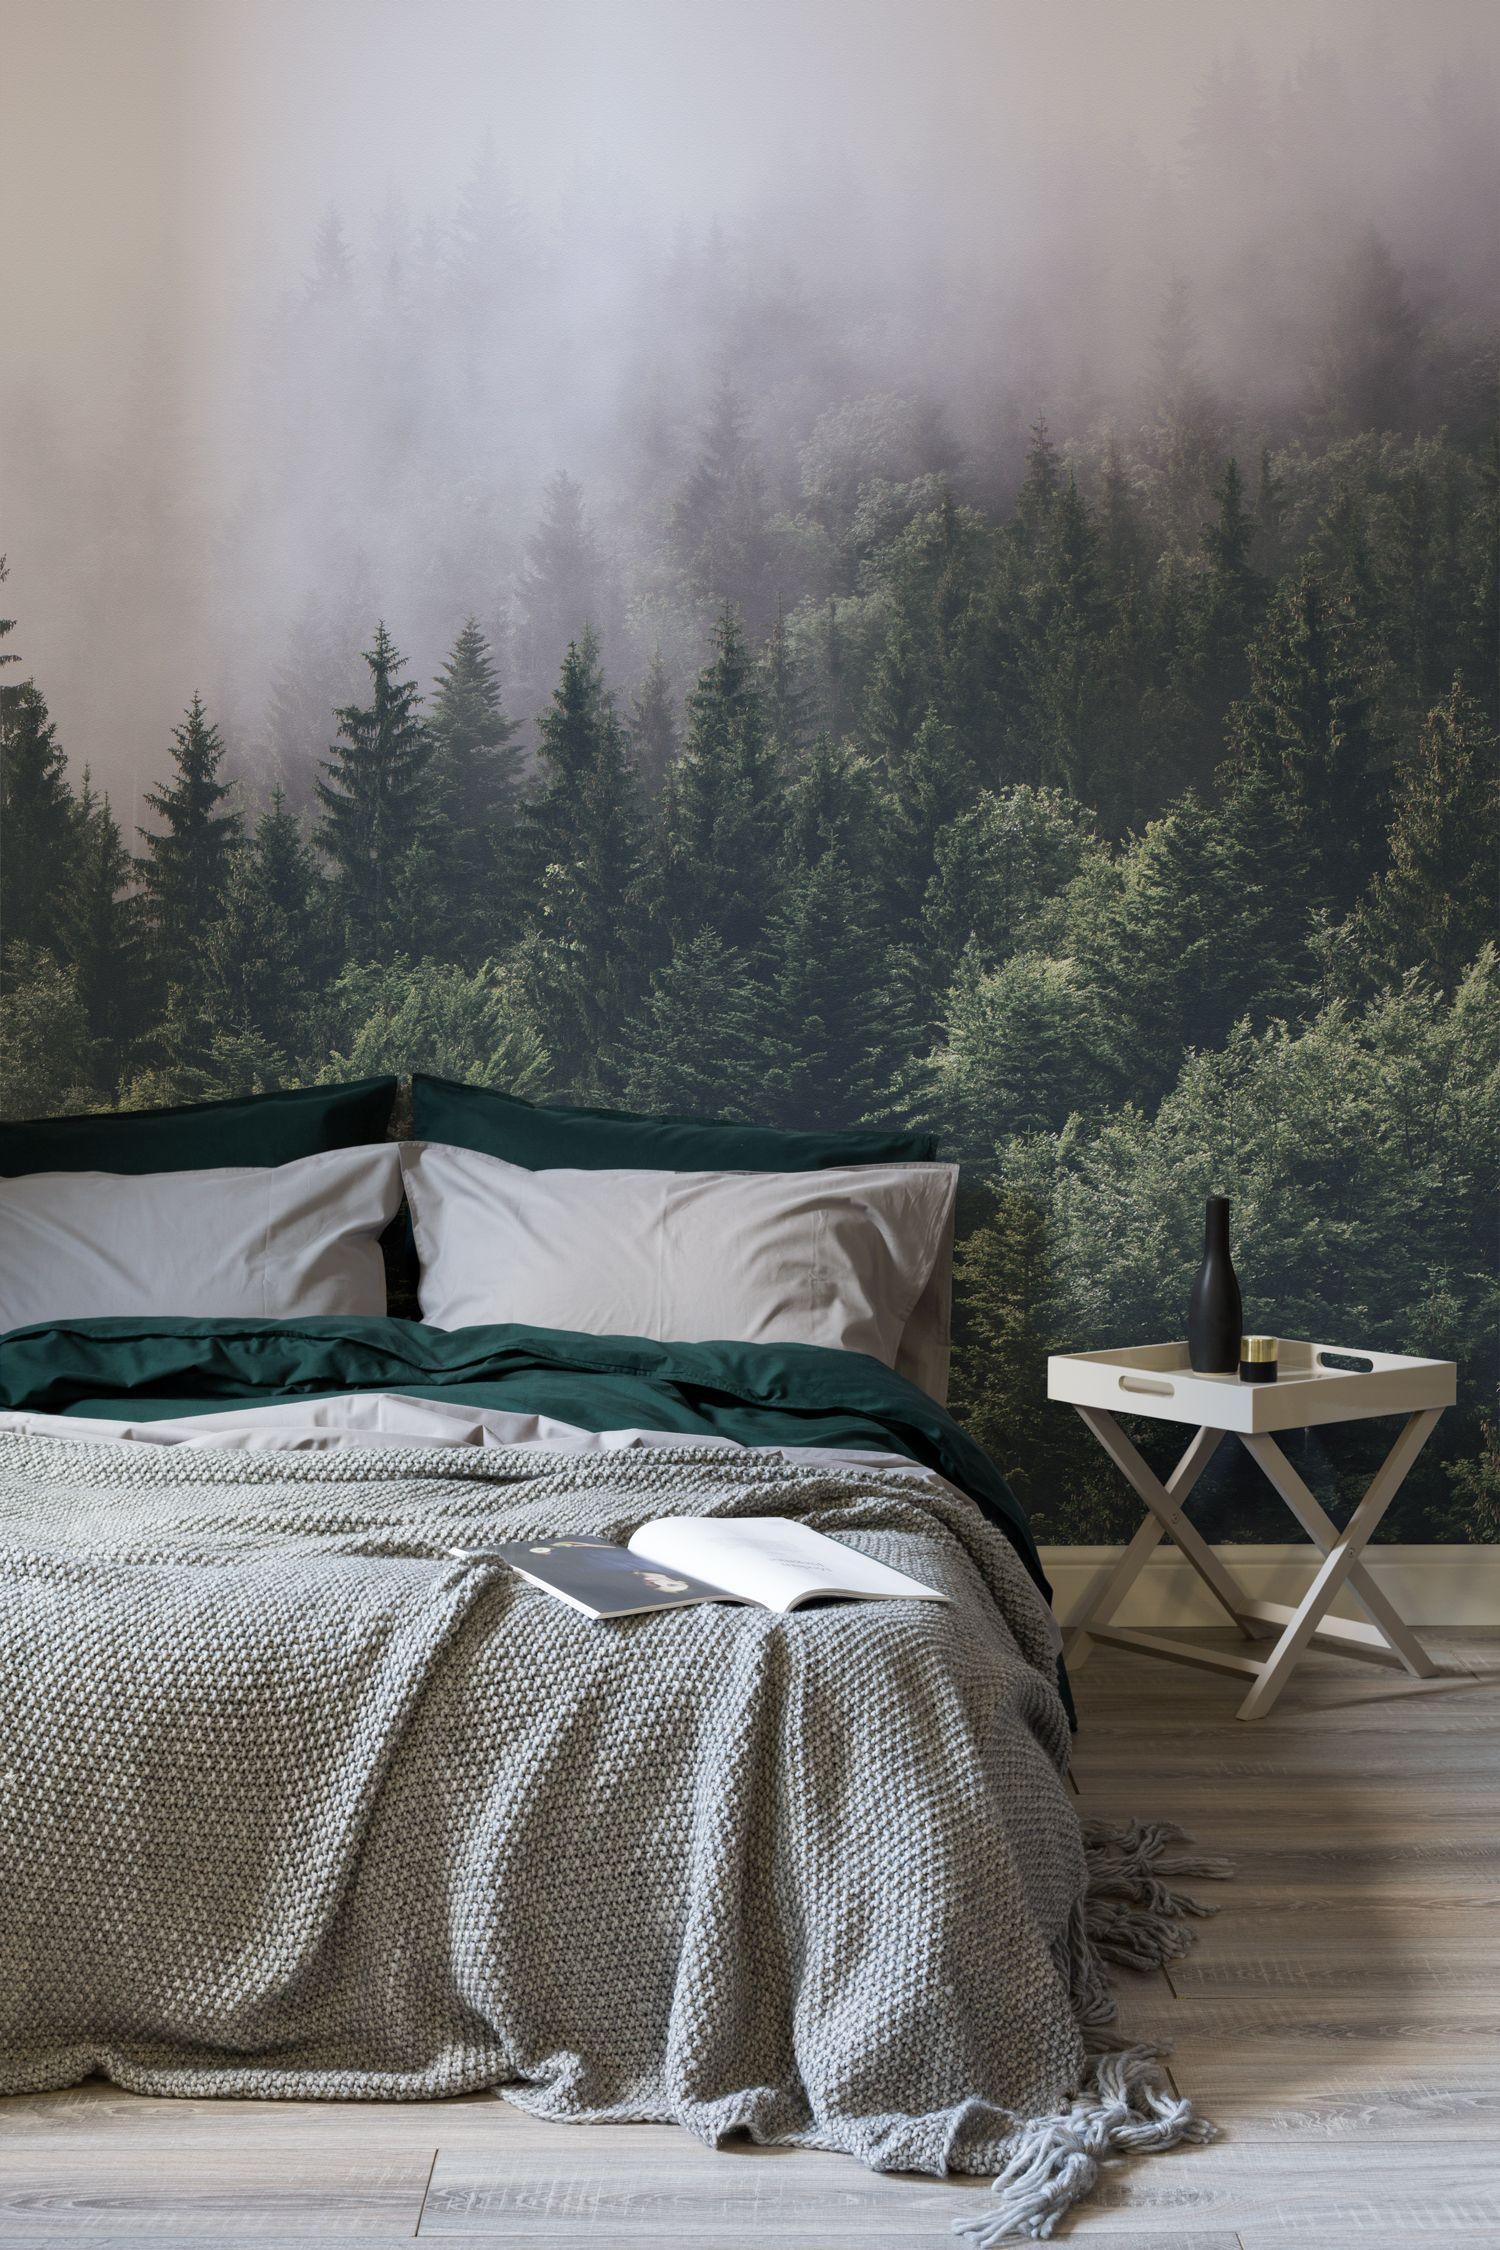 Cool 22 Best Natural Bedroom Design Ideas https://decoratio.co